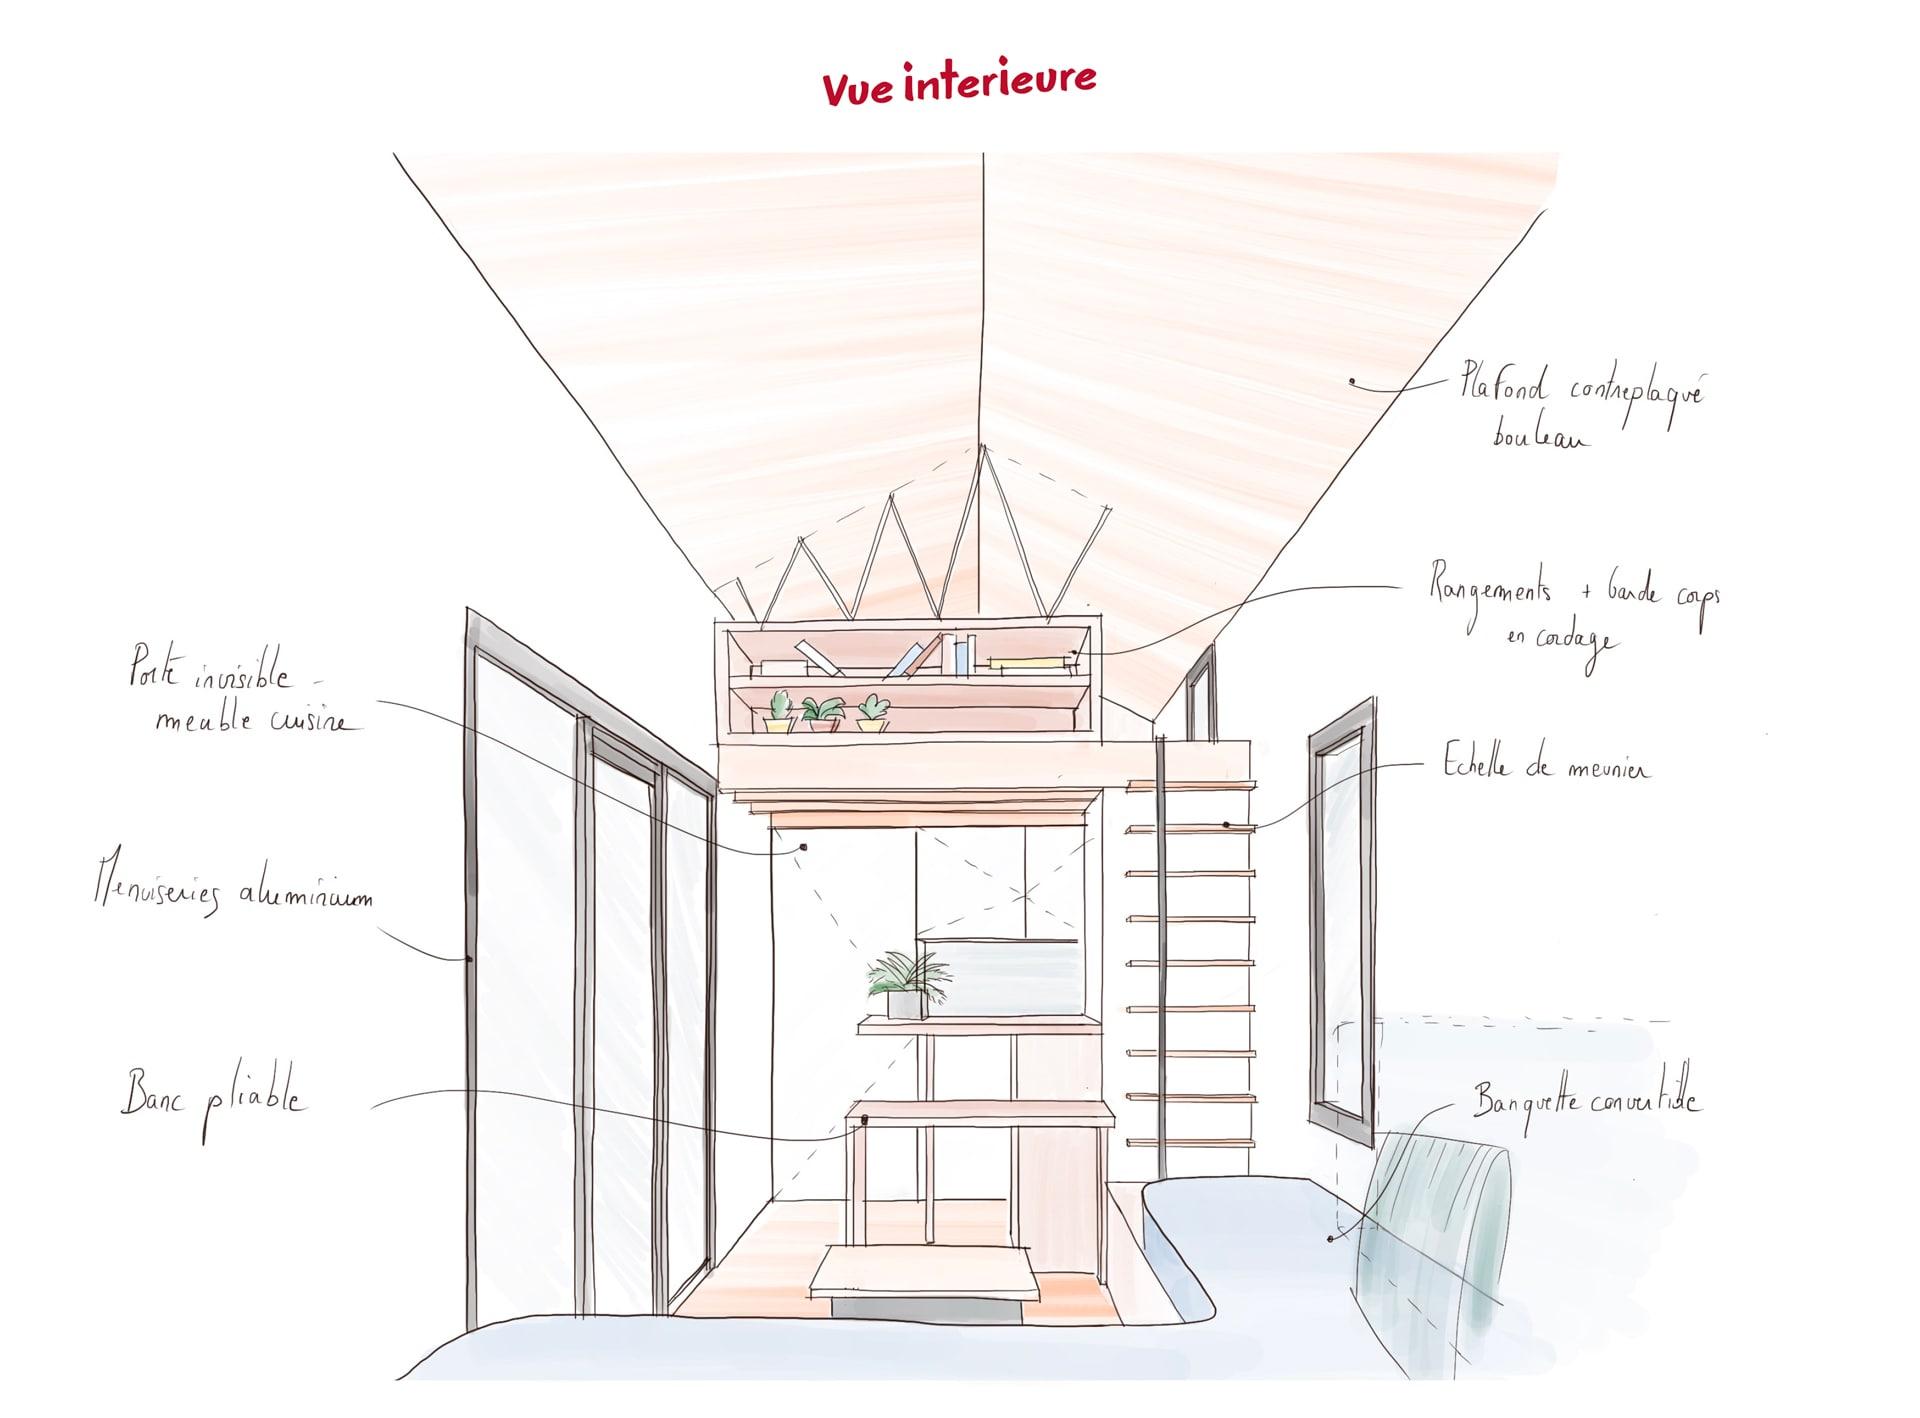 tiny-house-particulier-original-vue-interieure